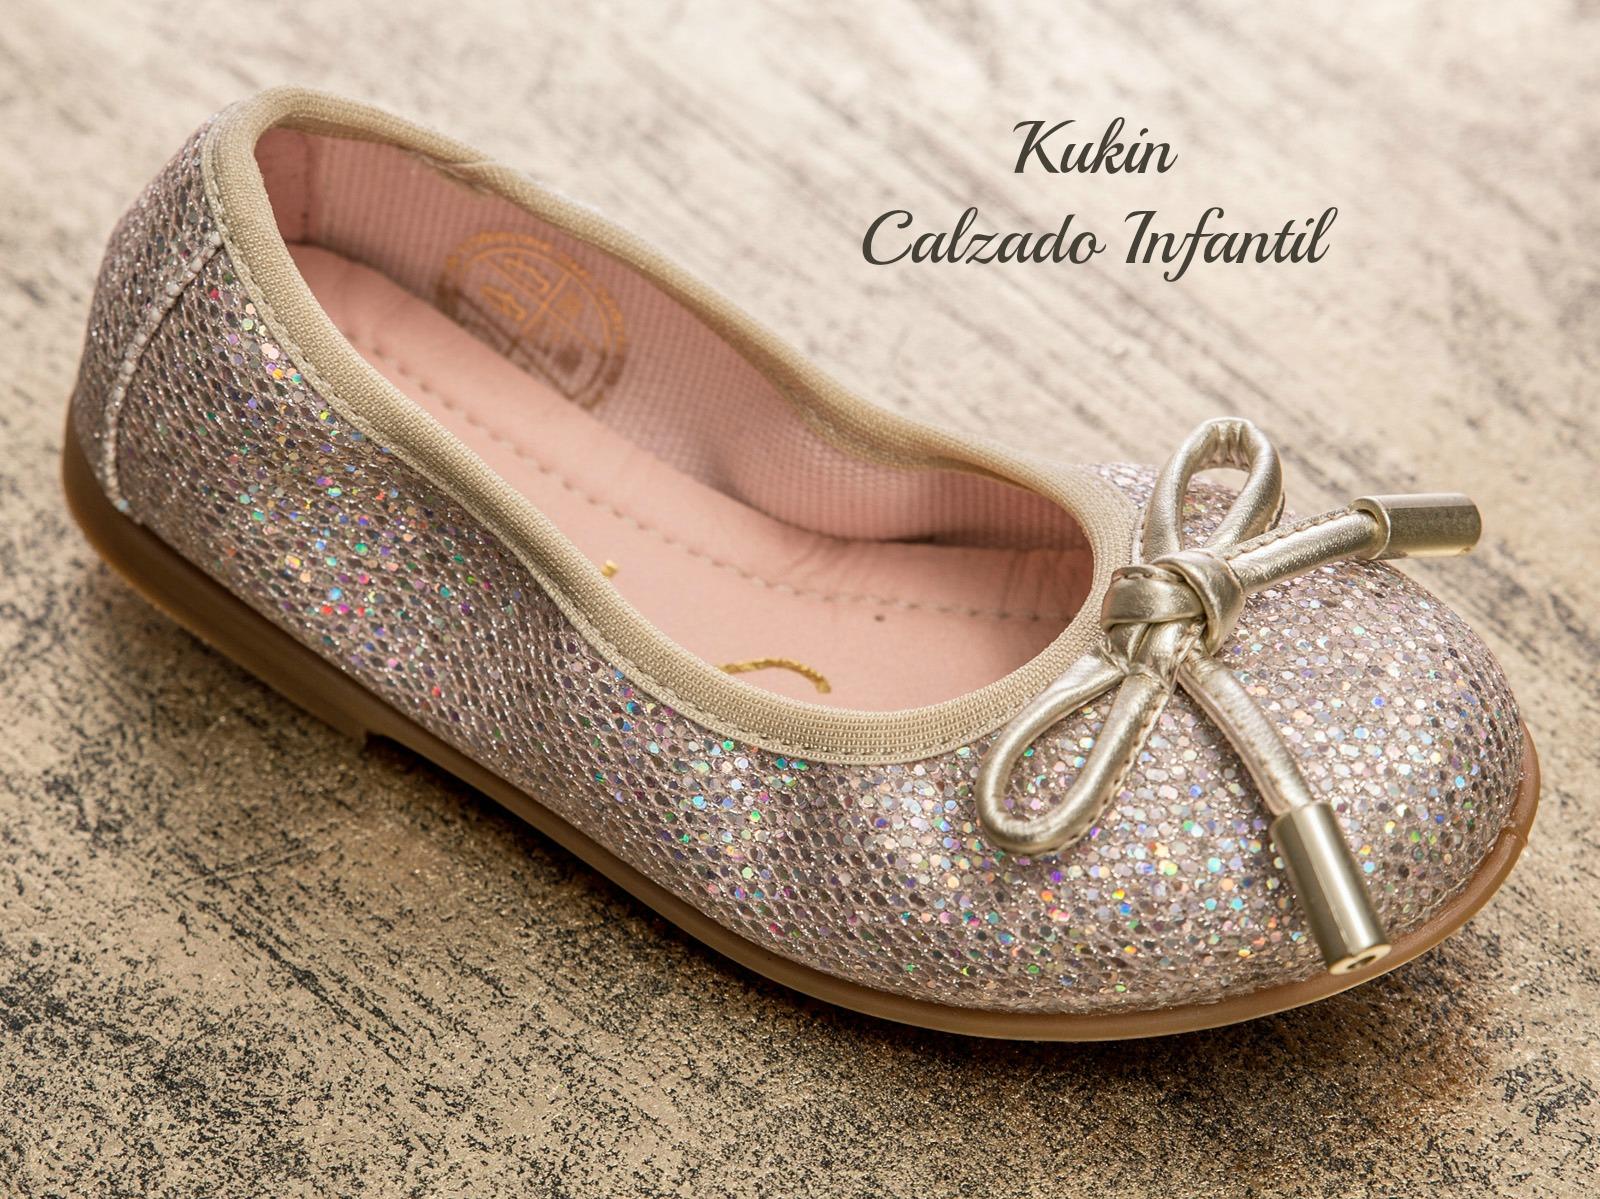 Bailarinas unisa para ni a kukin calzado infantil blog - Ideas para decorar zapatos de nina ...